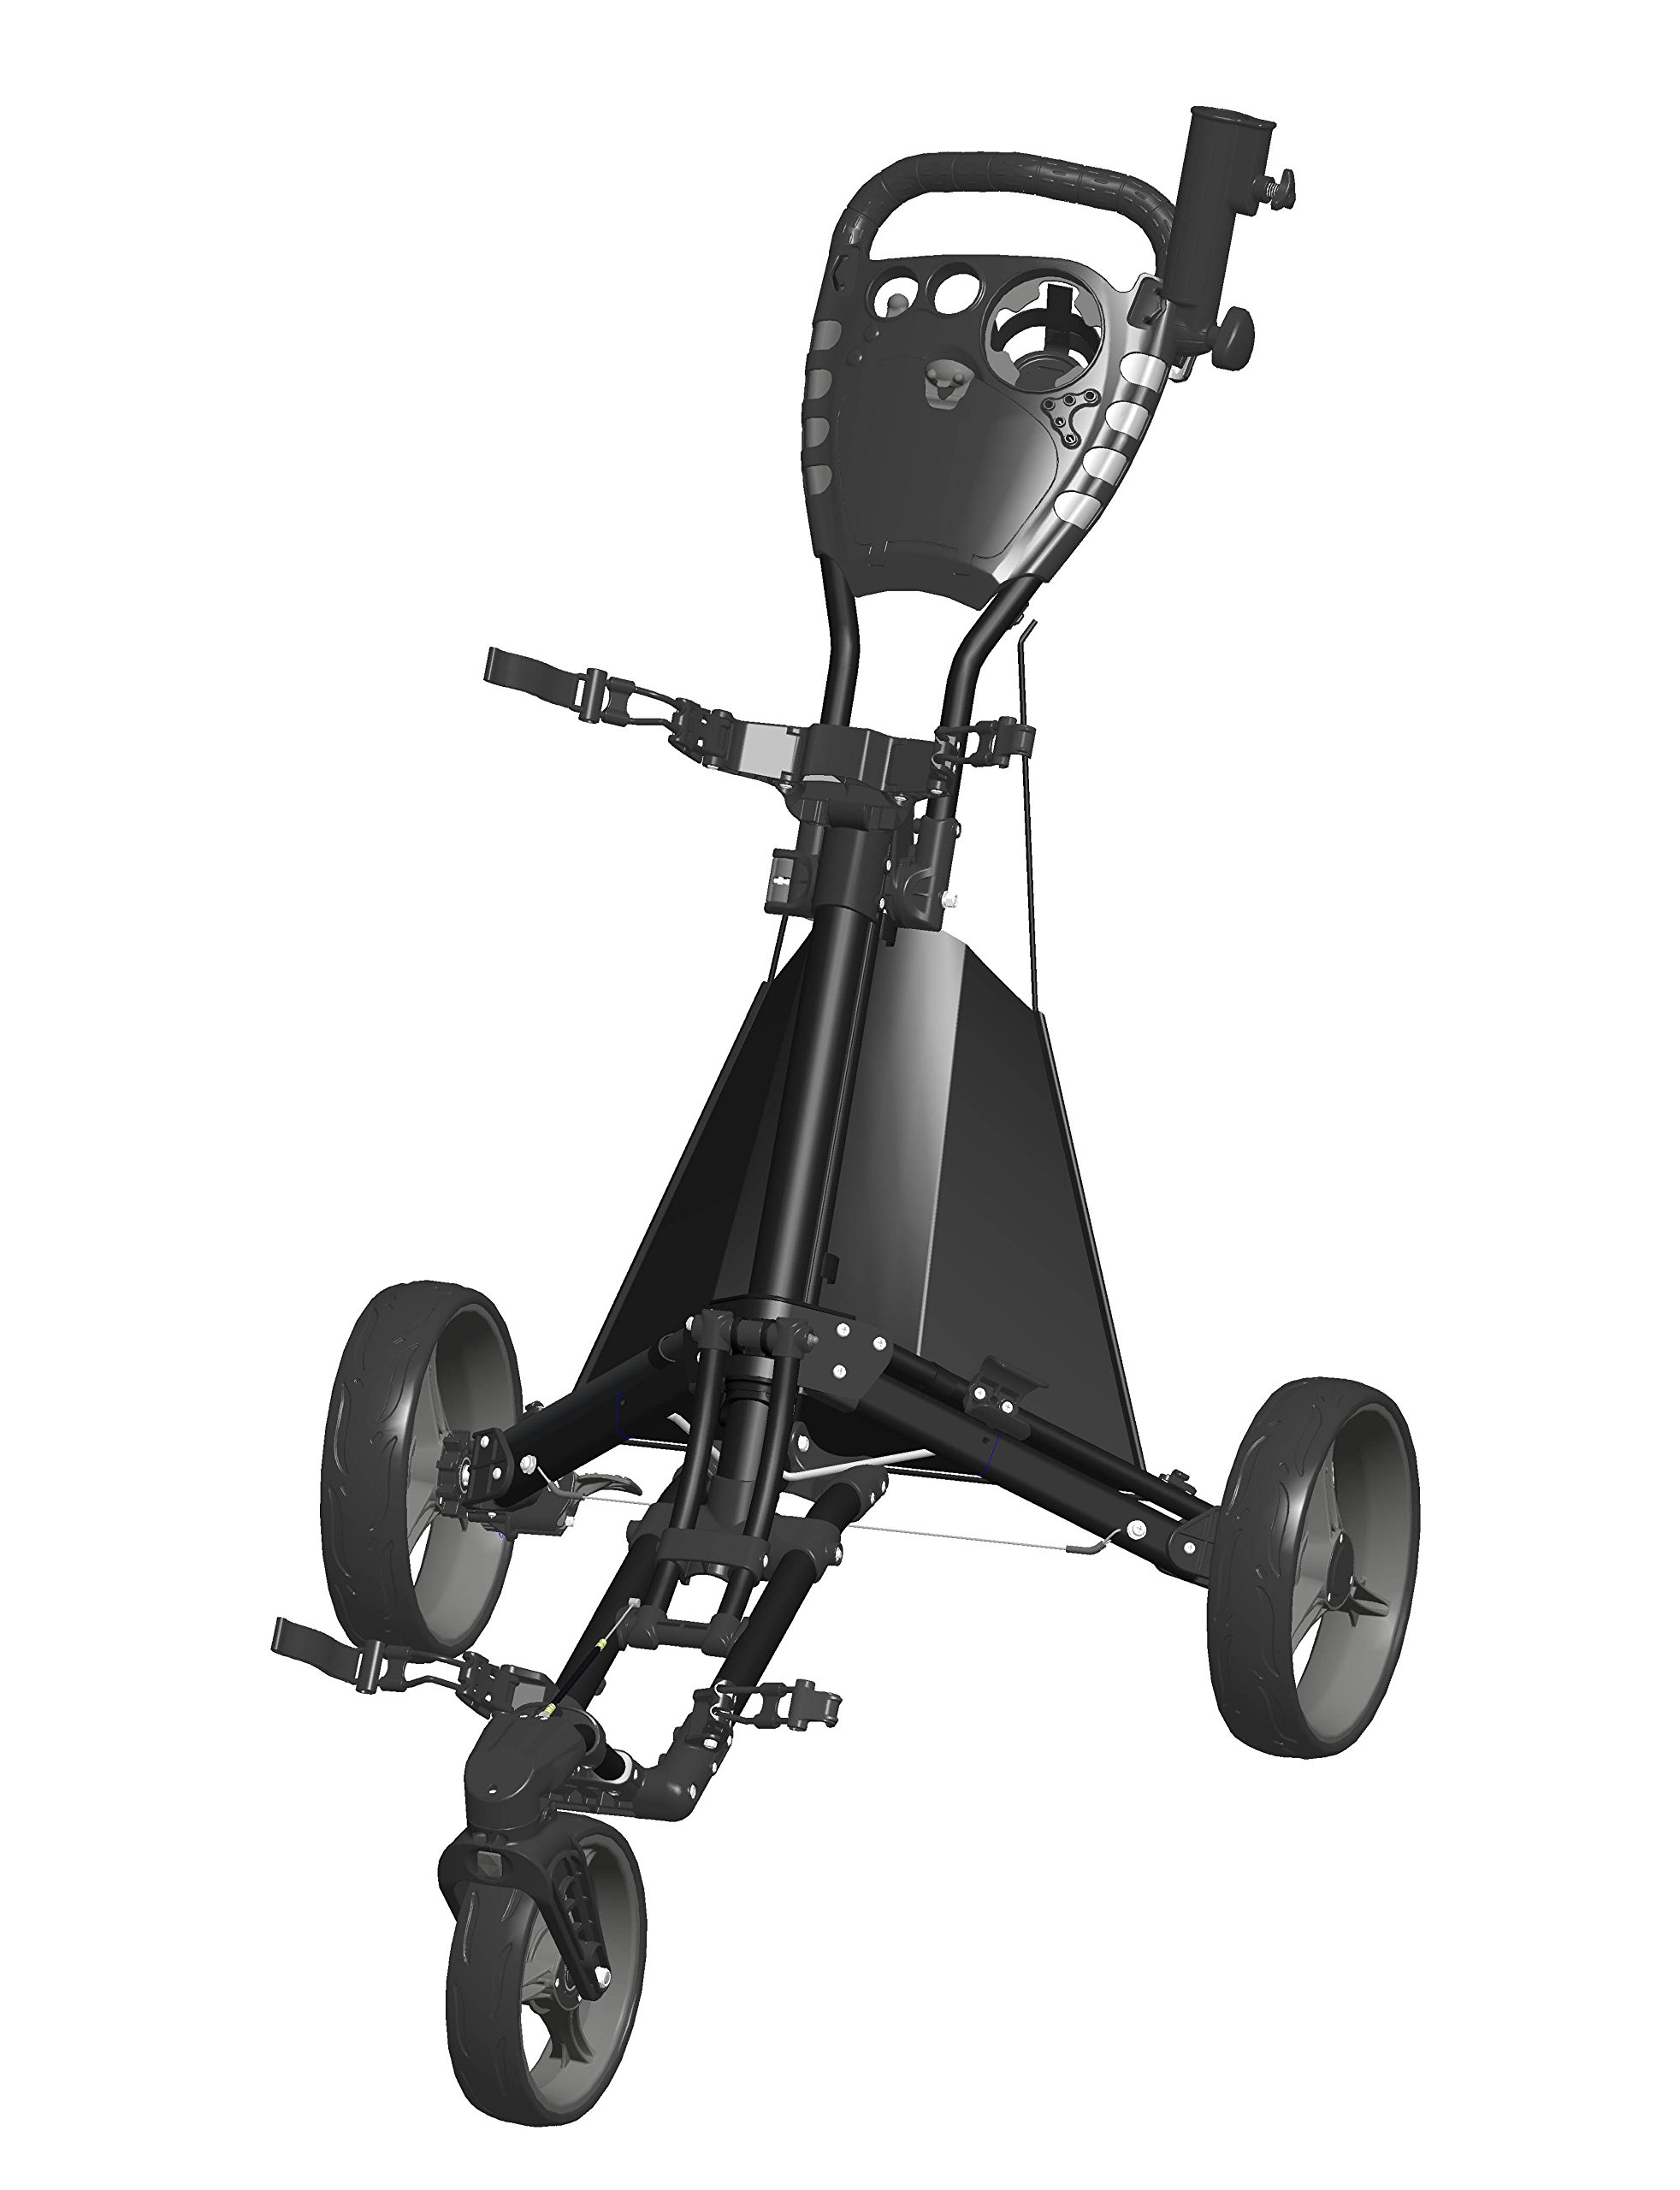 Easy Drive Push Cart, Swiveling Front Wheel - Black/Gray - GCDRIVE-BS